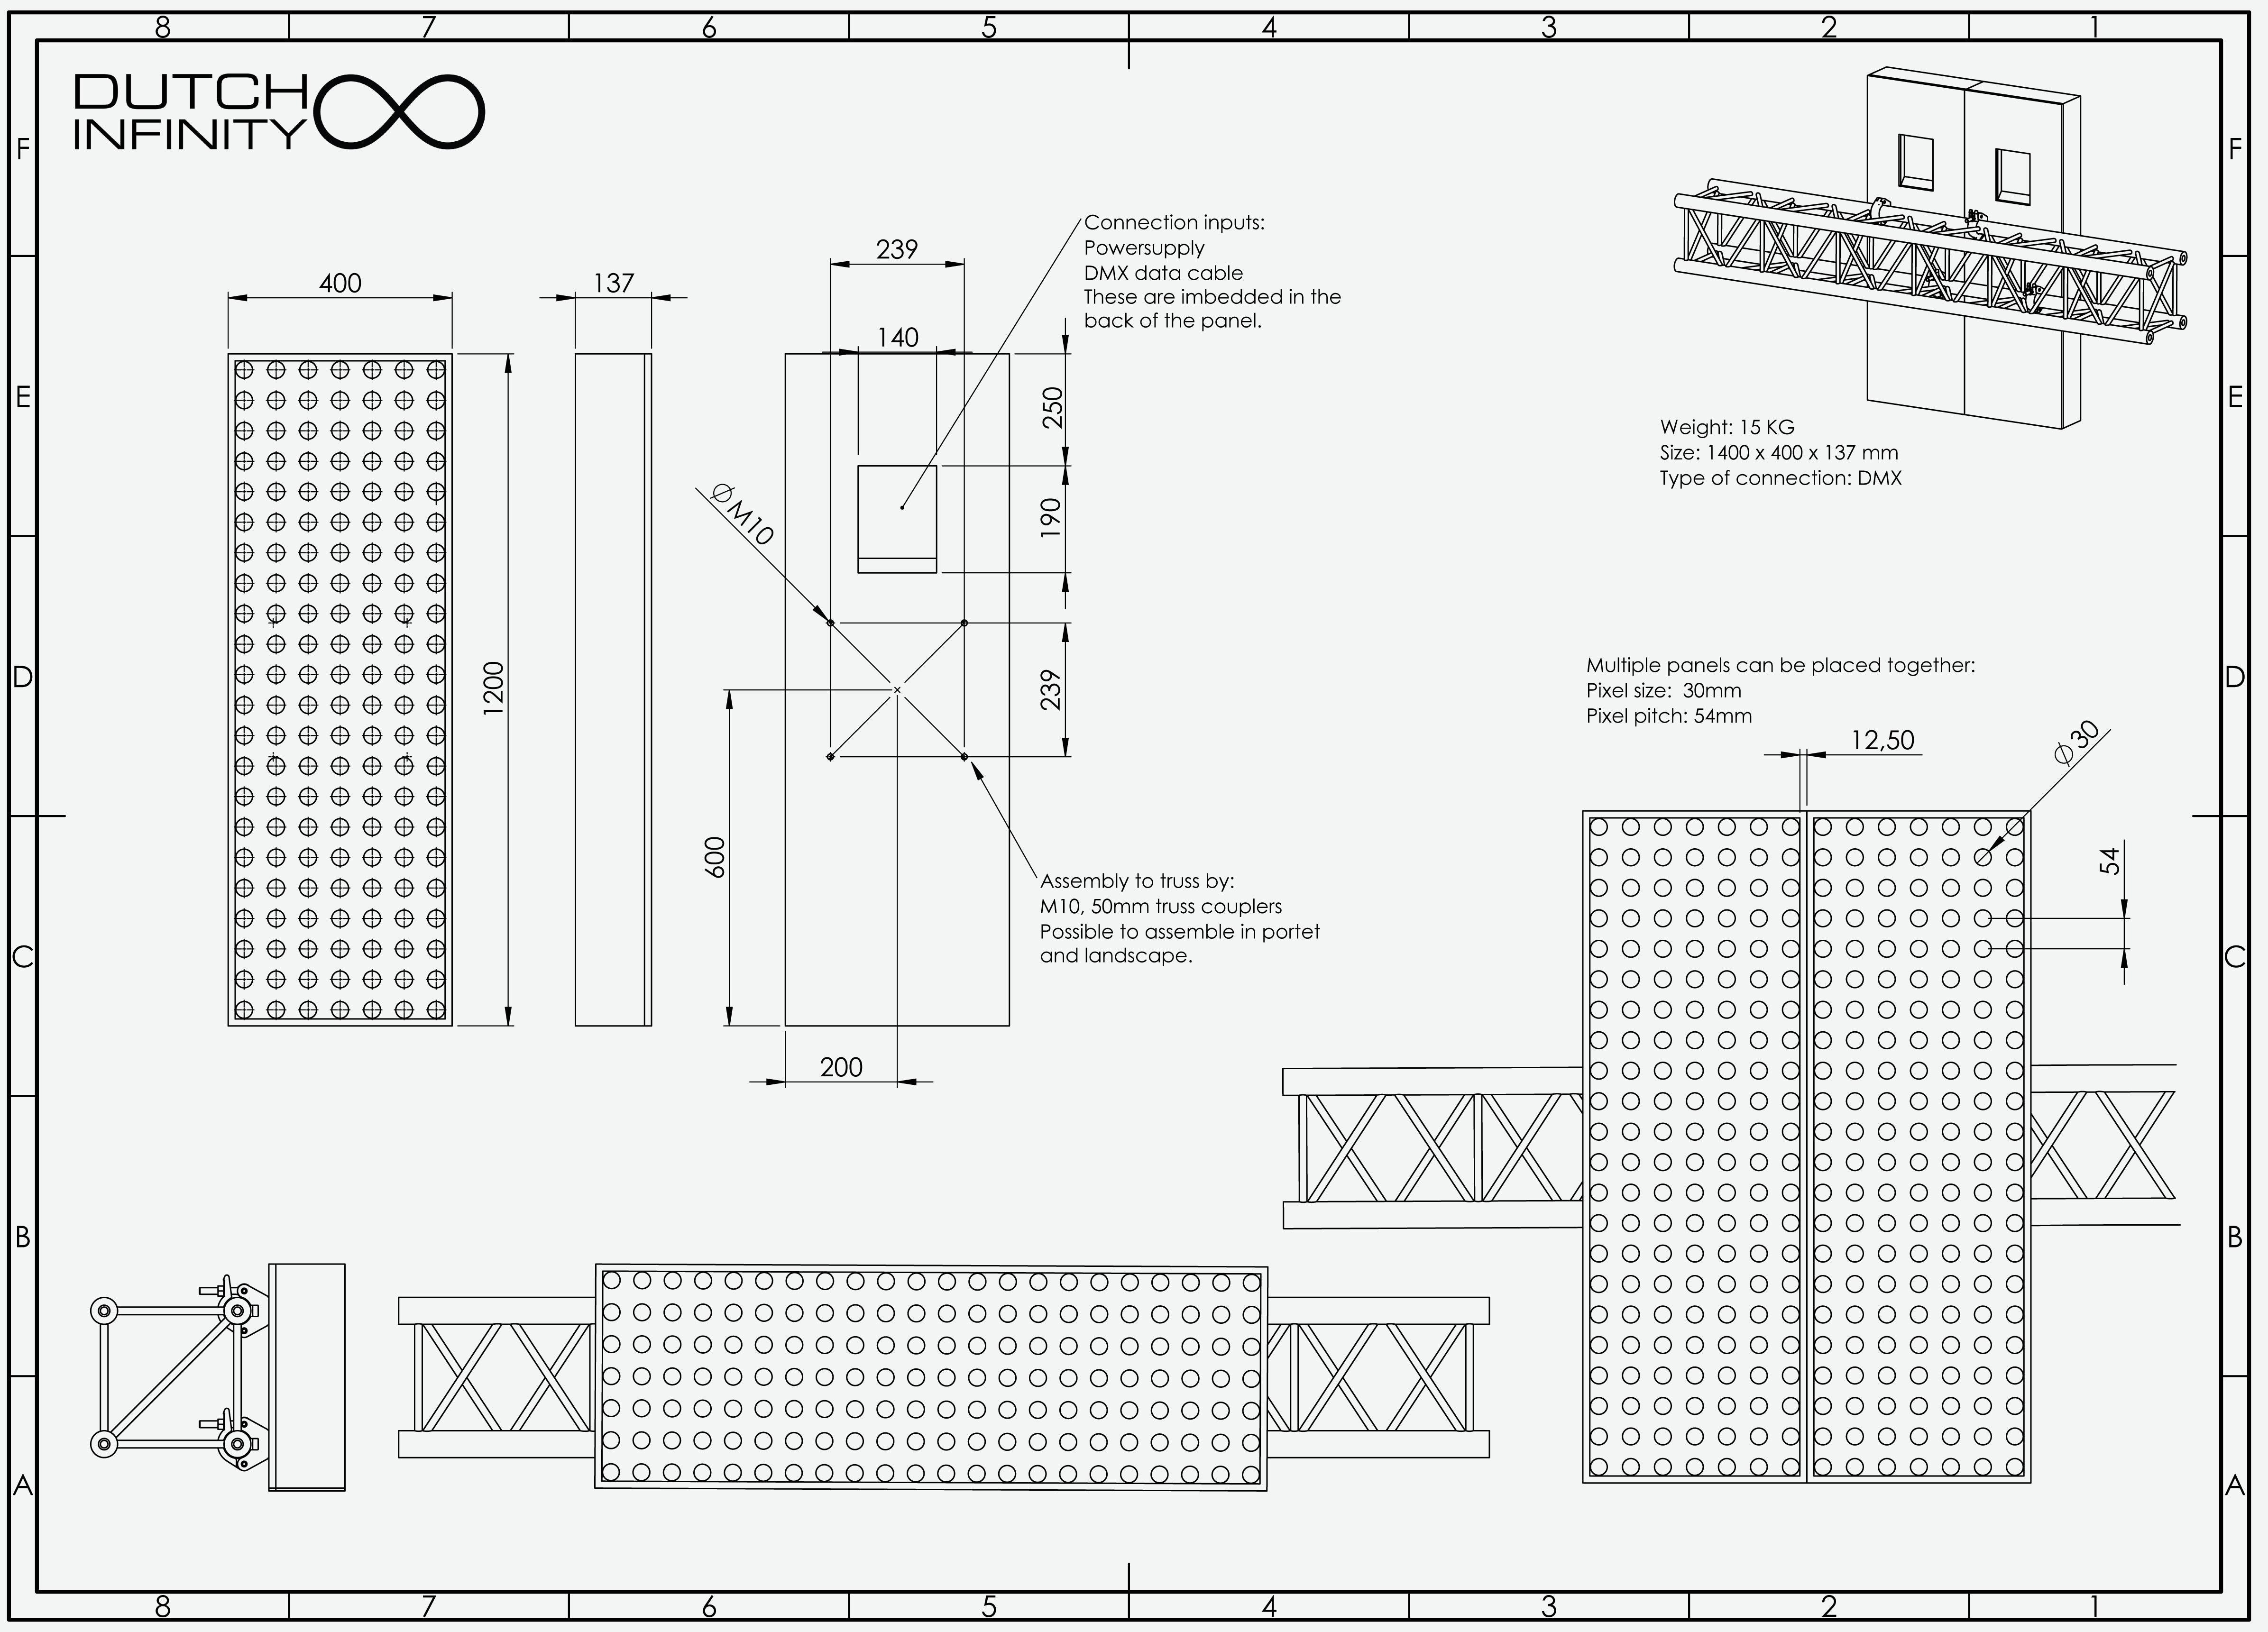 Dutch Infinity DMX panel english